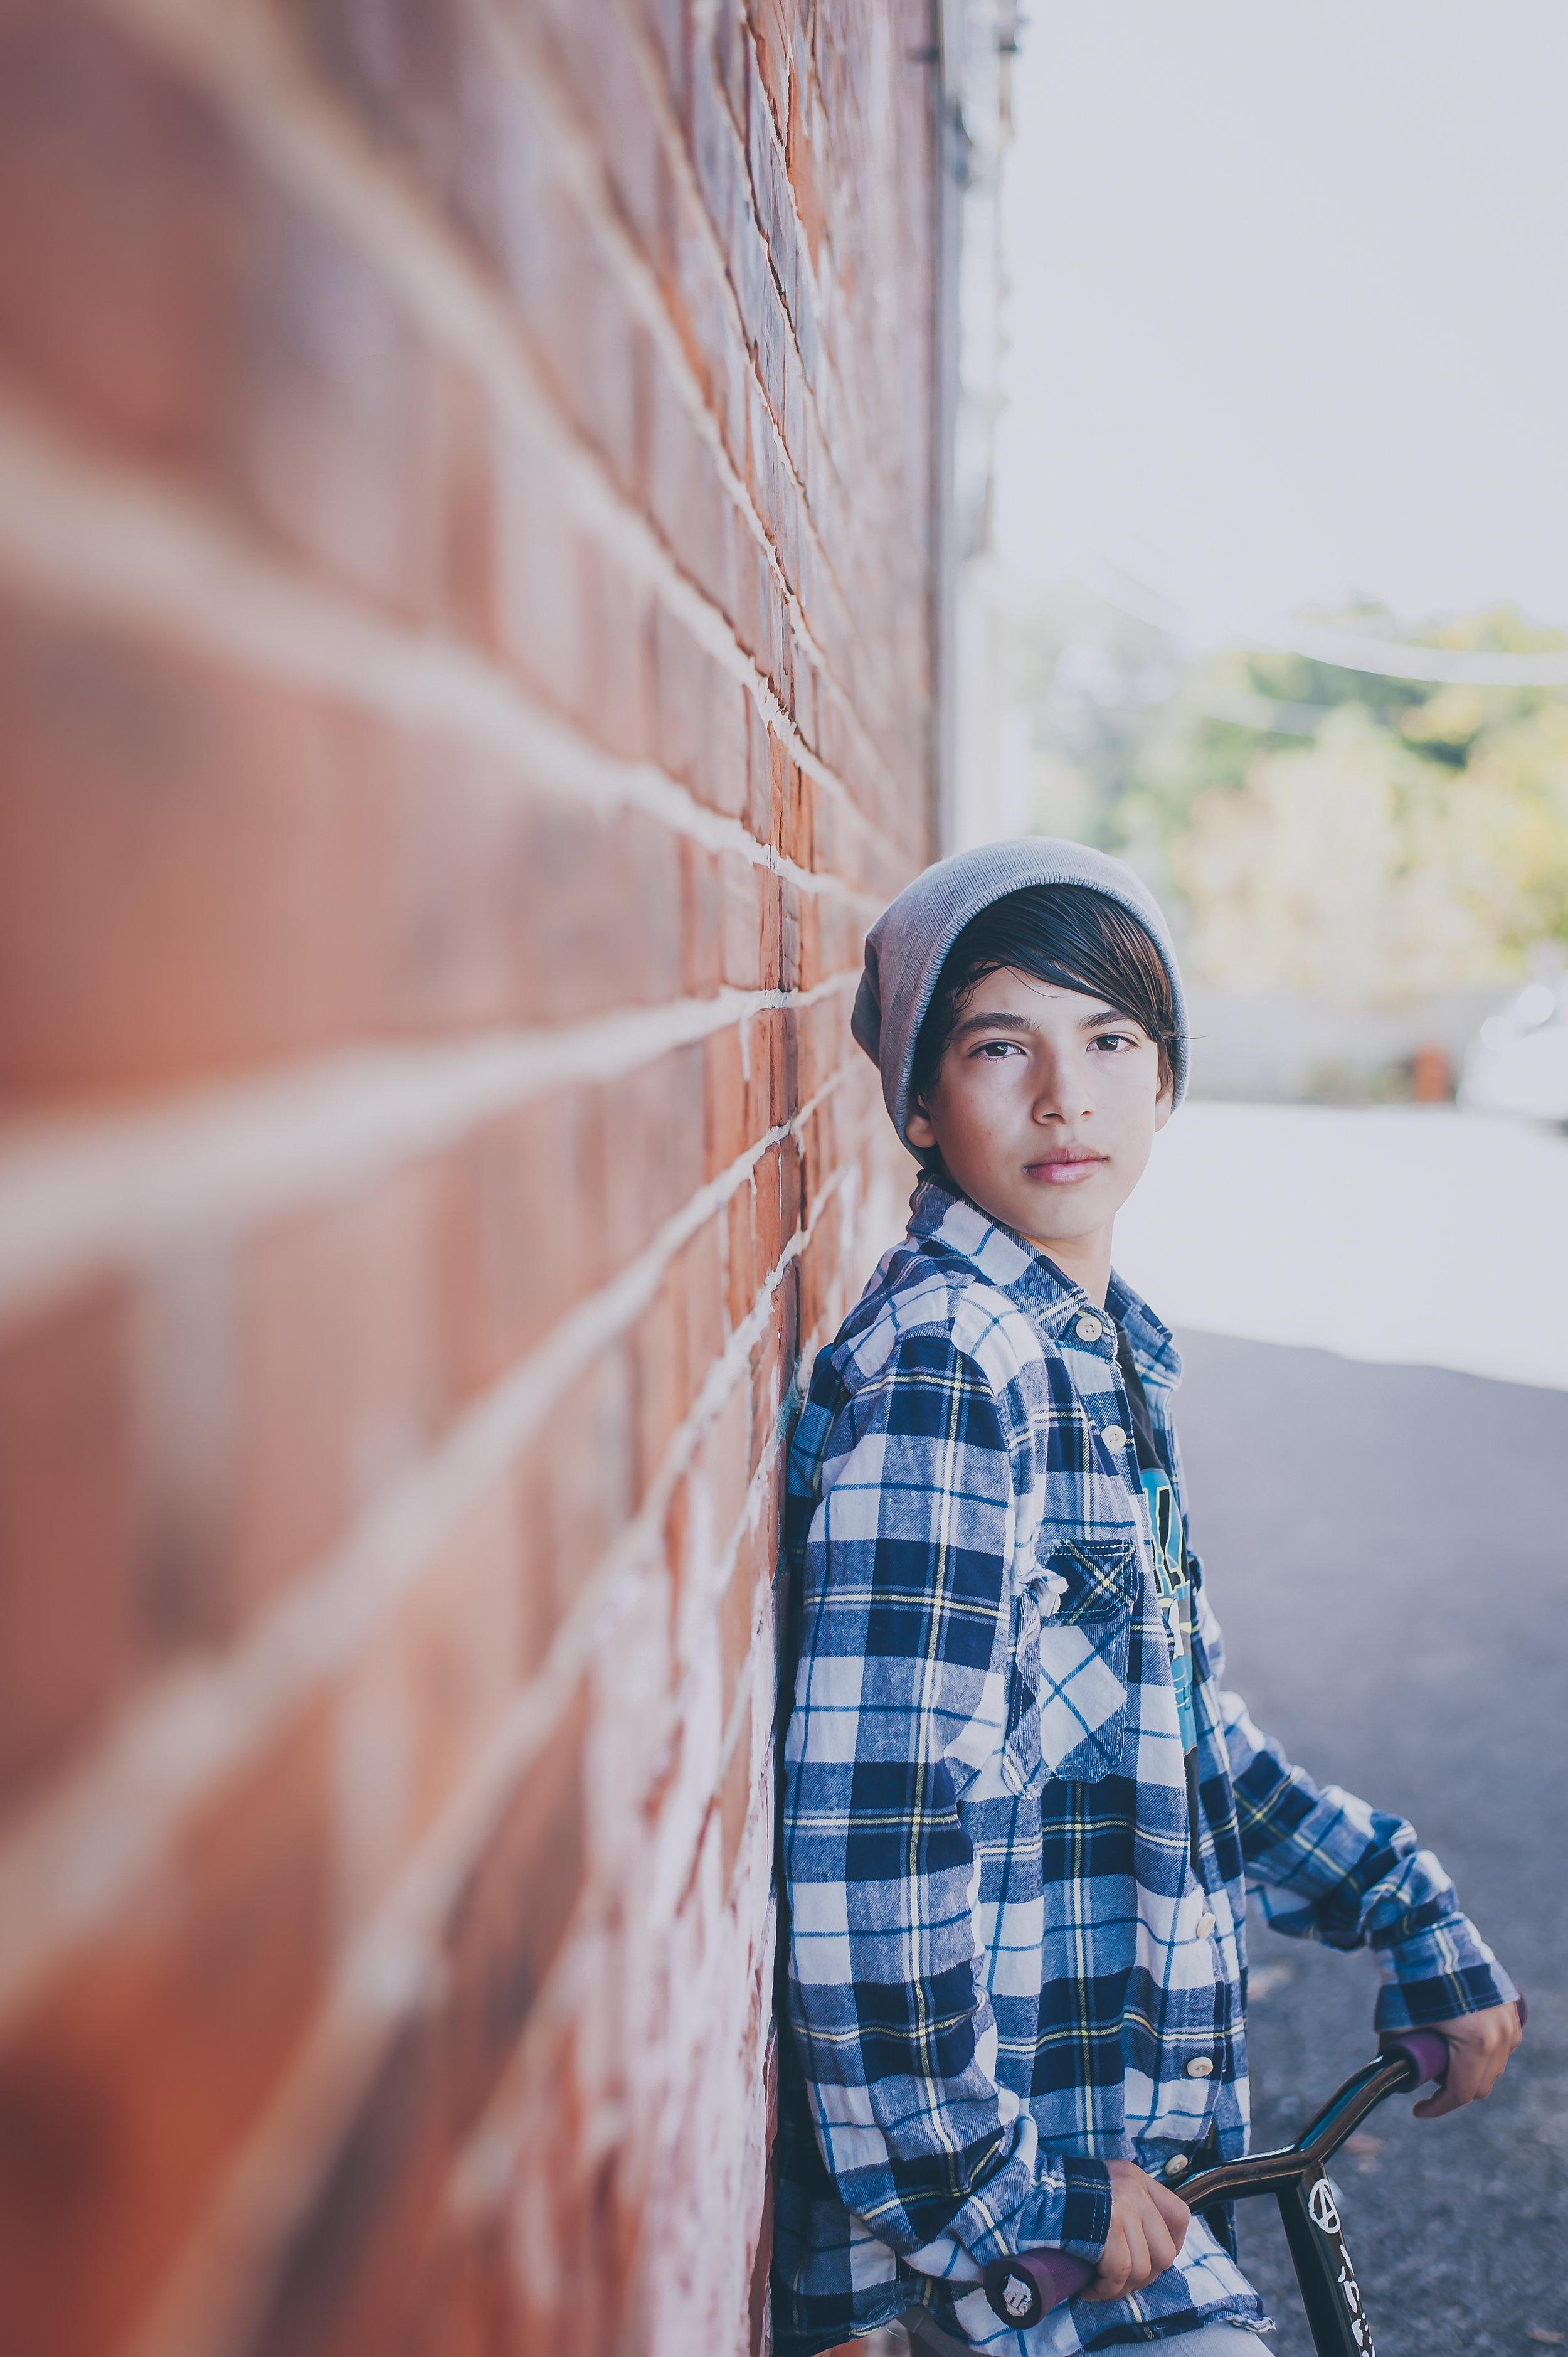 children's photographer, lifestyle photographer,Burlington childre's photographer